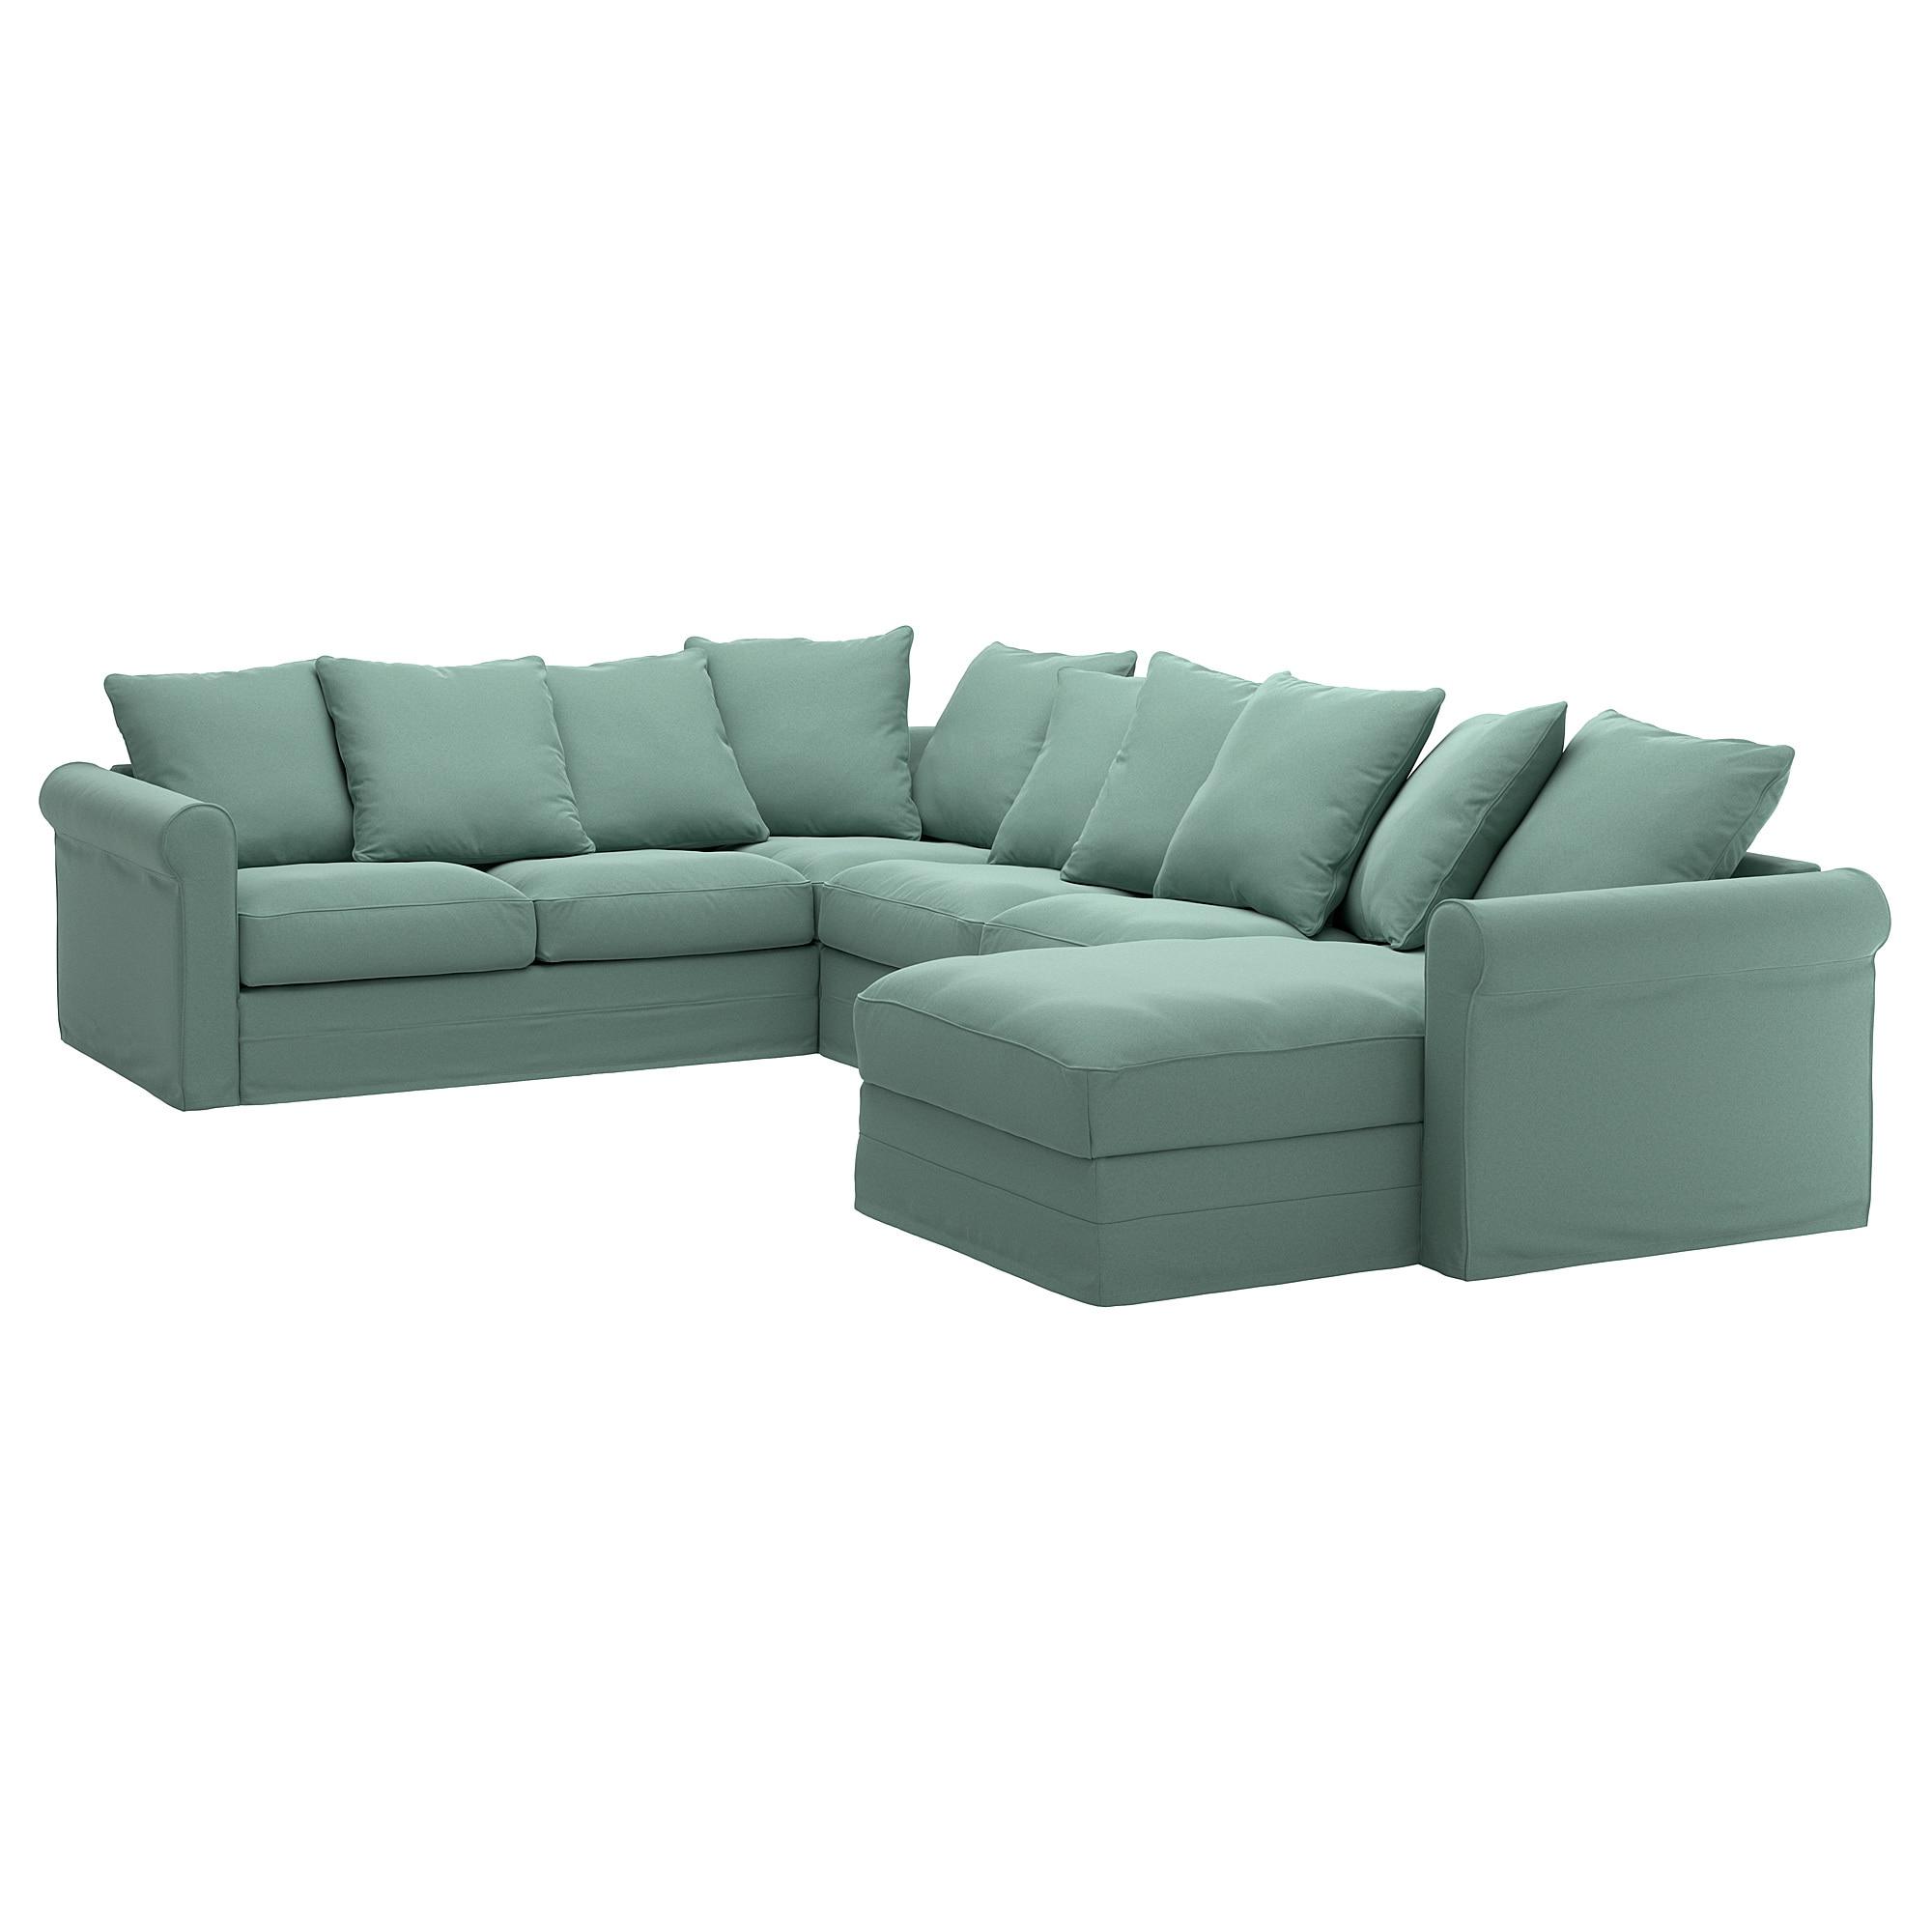 Sofá Chaise Longue Ftd8 sofa 5 Plazas Chaise Longue Gr C3 B6nlid sof A 7069